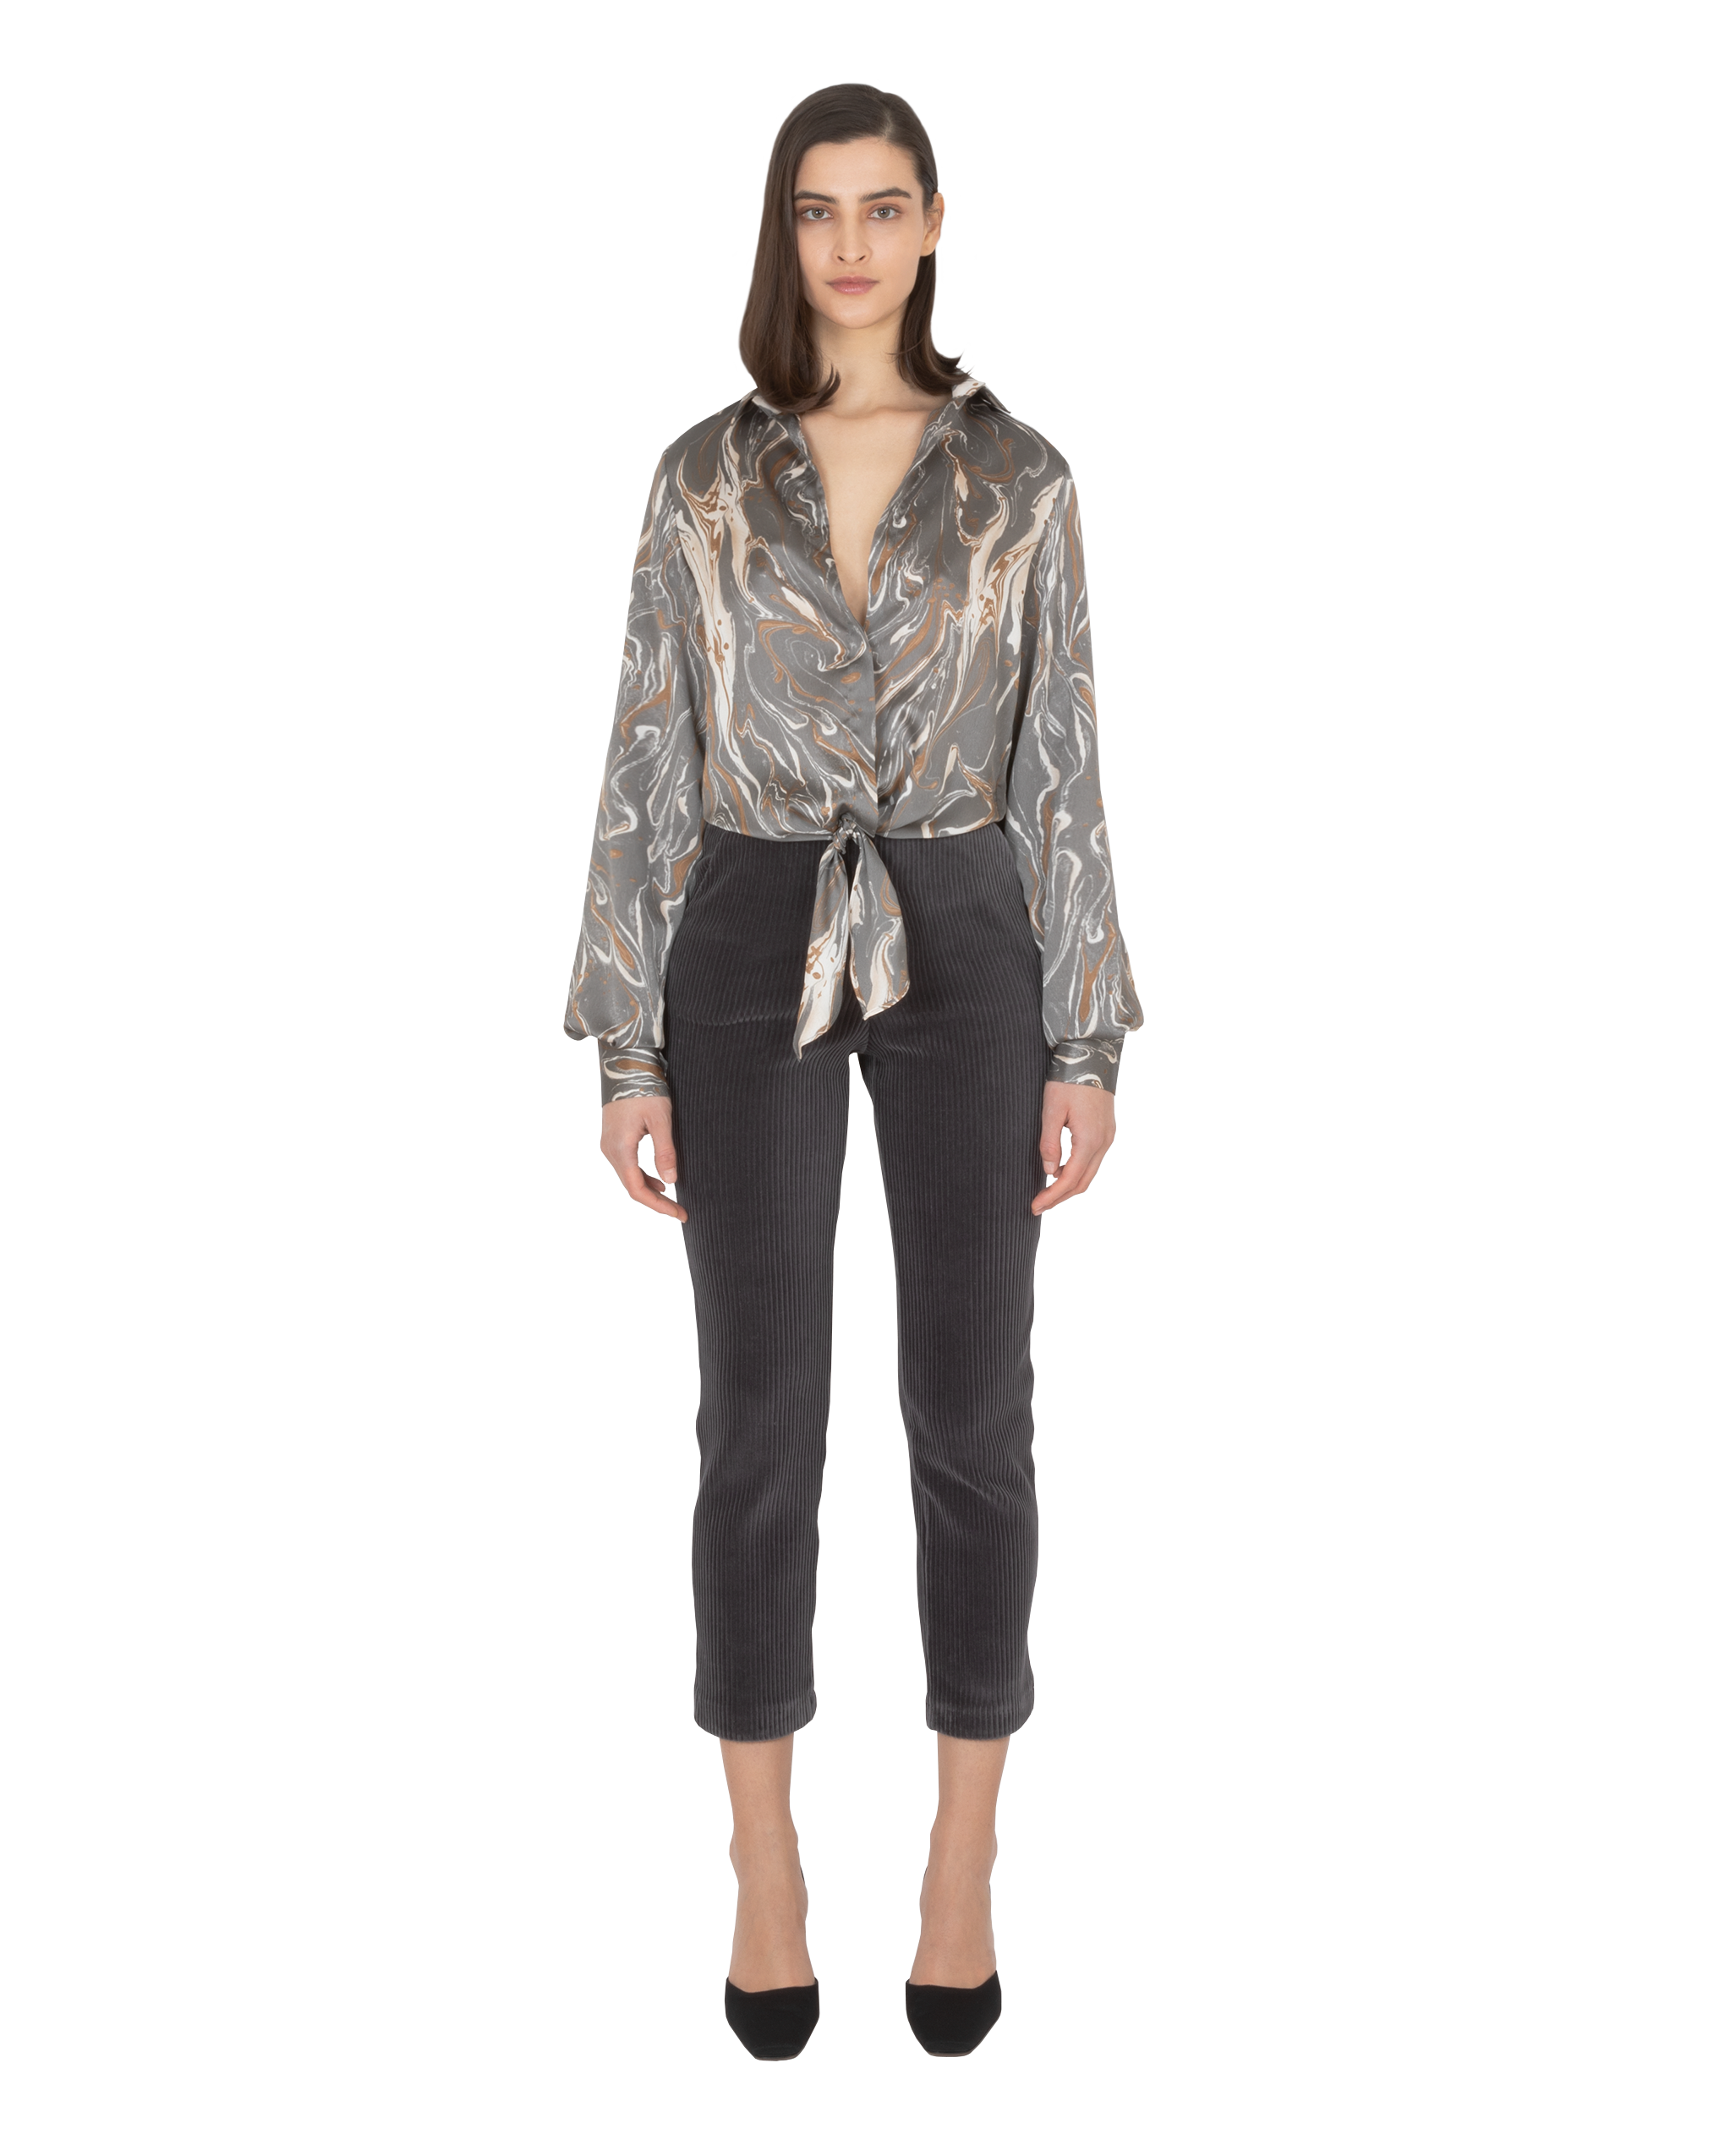 Model wearing EMIN + PAUL charcoal print tie-front blouse.